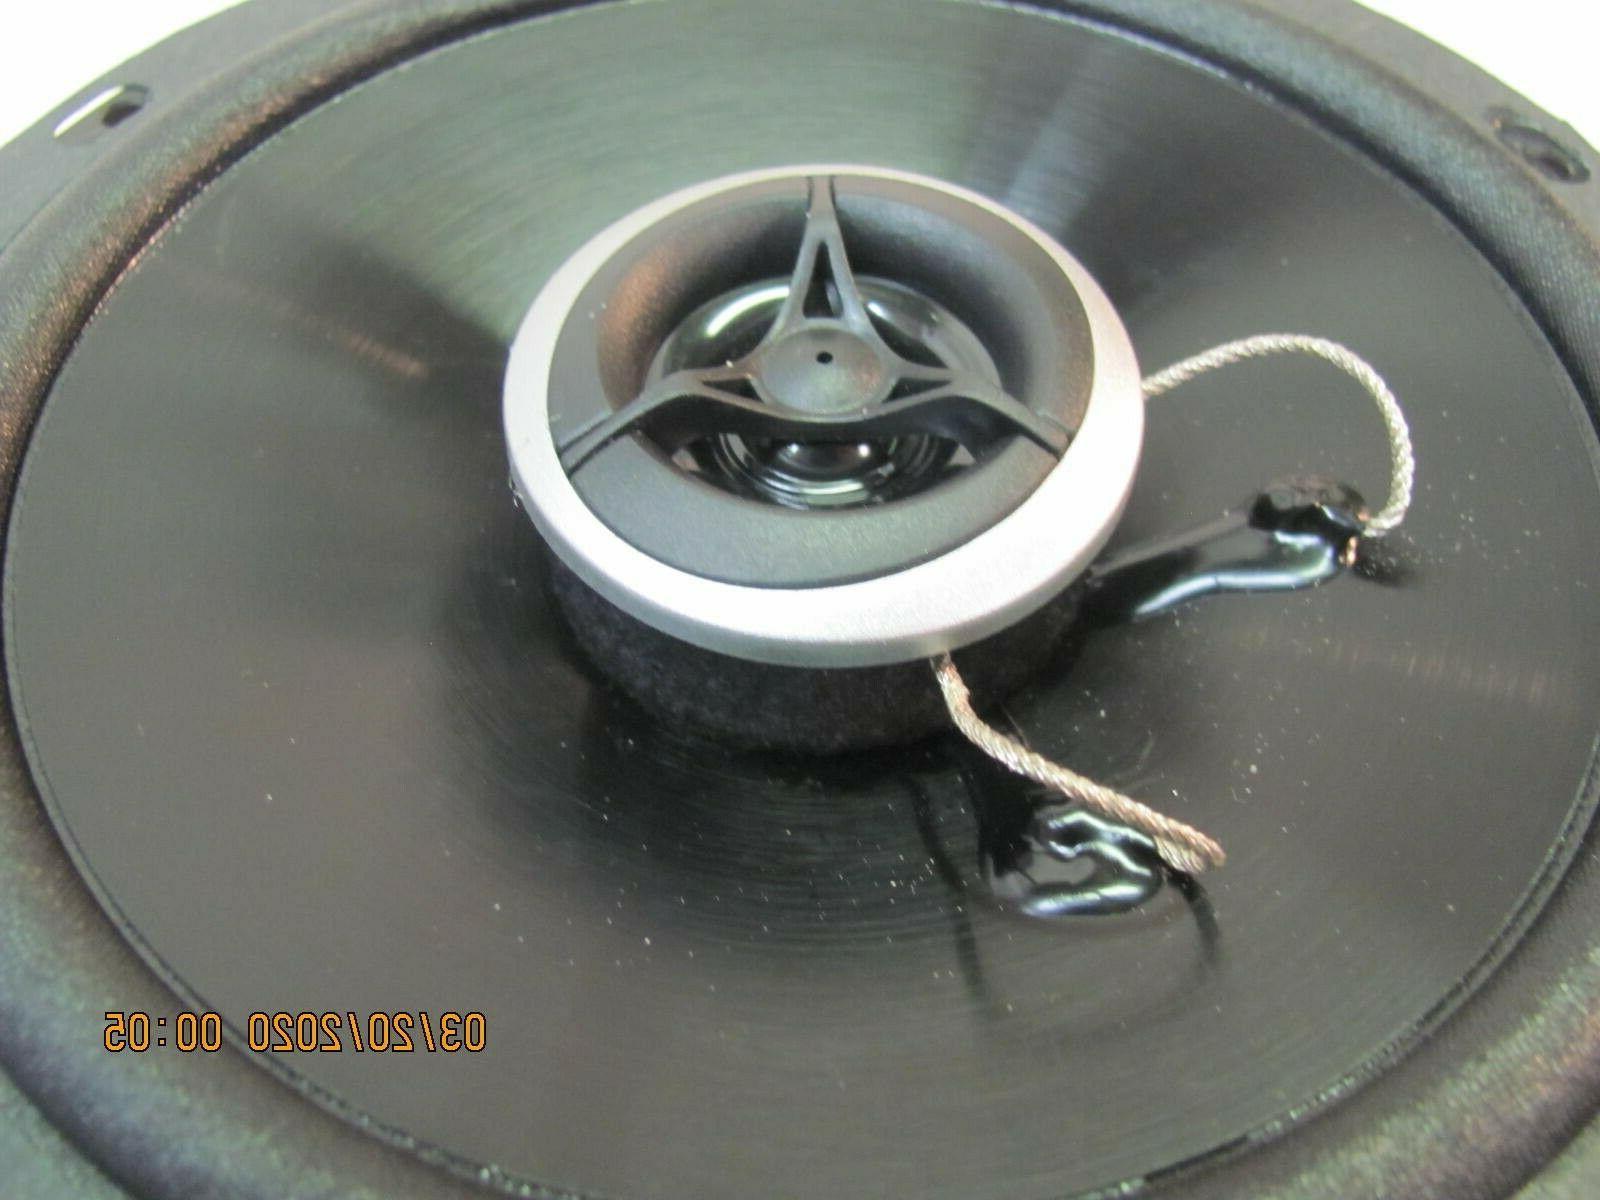 "6.5"" watt coaxial car speakers new."